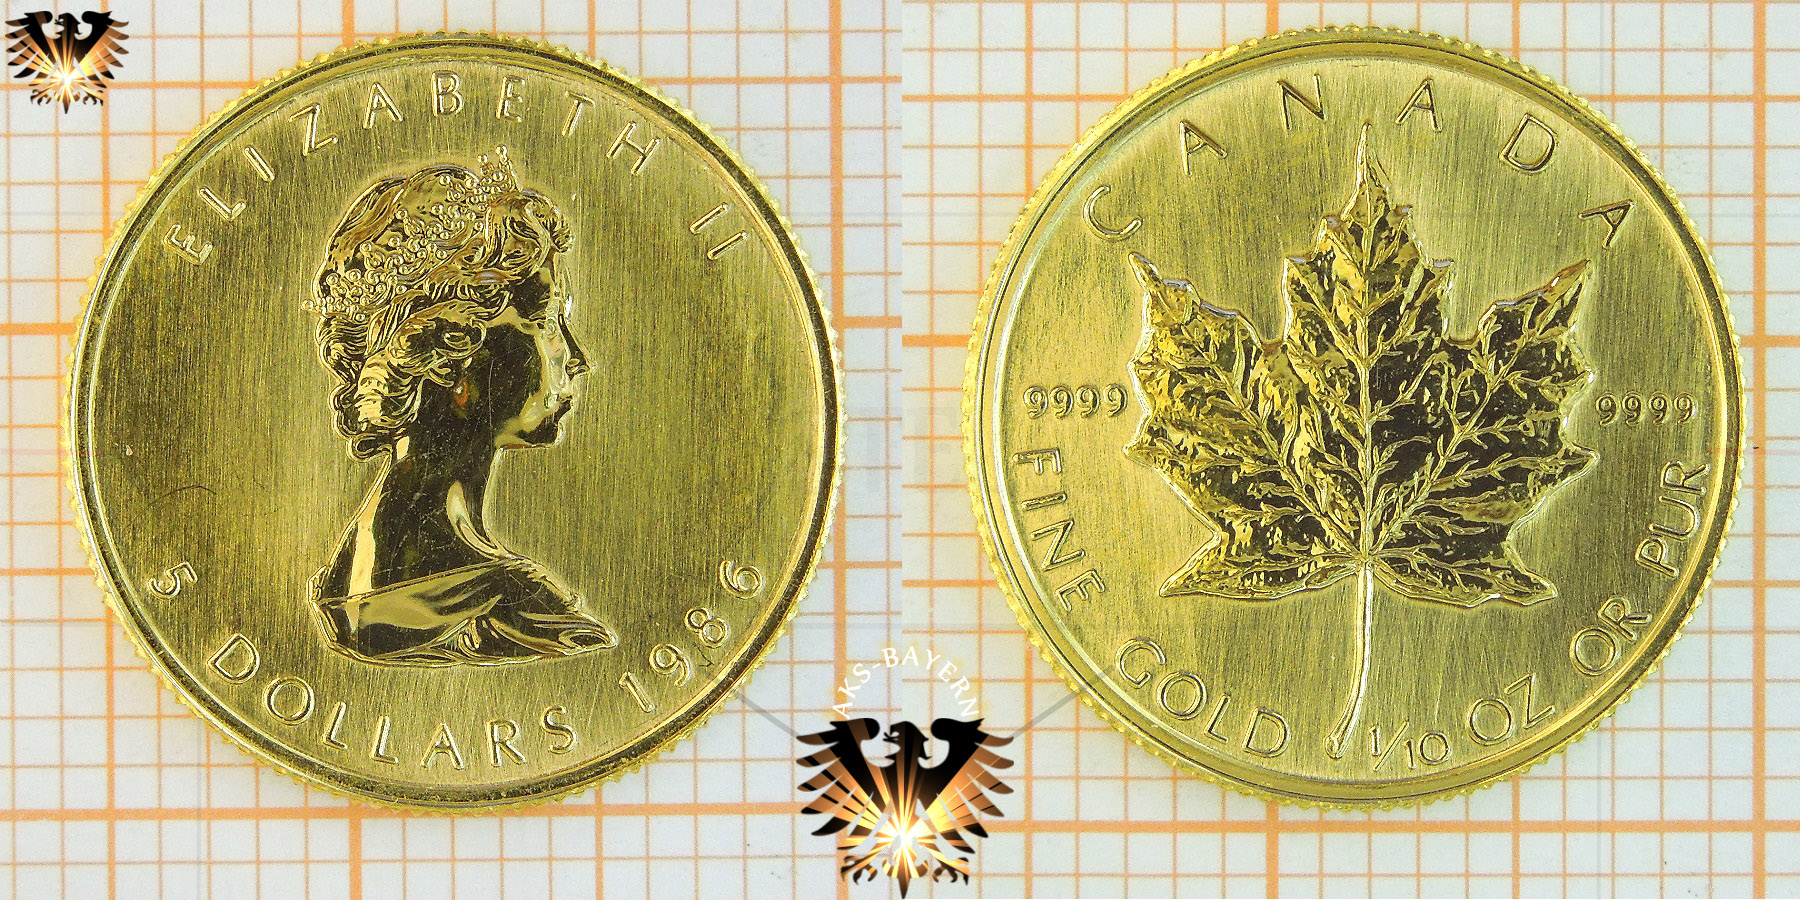 1 oz canadian maple leaf coin